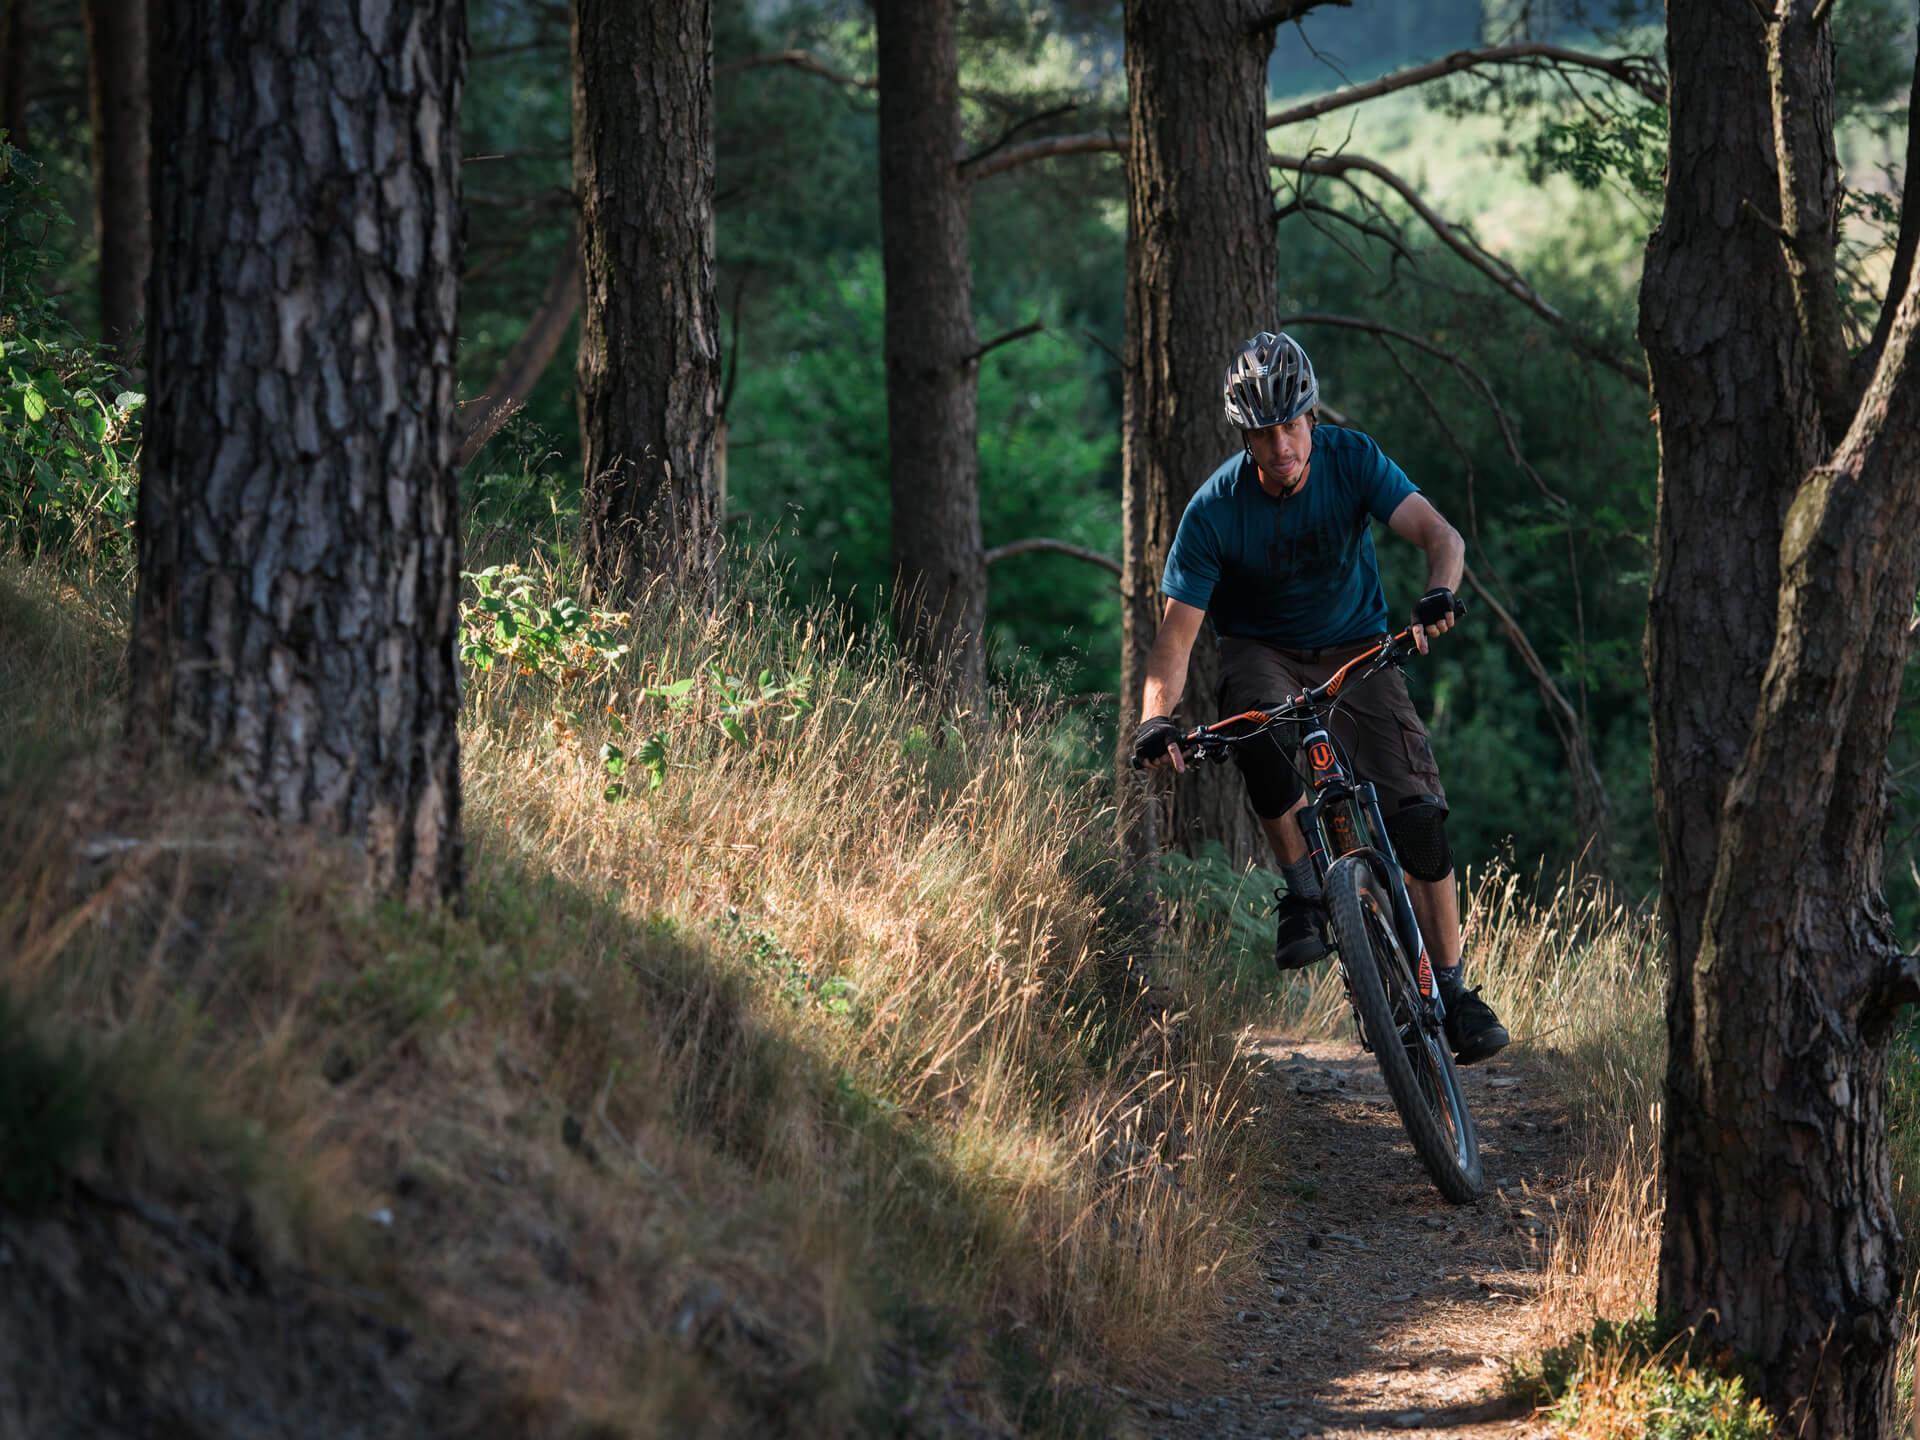 Darren Fawr Mountain Biking Trails